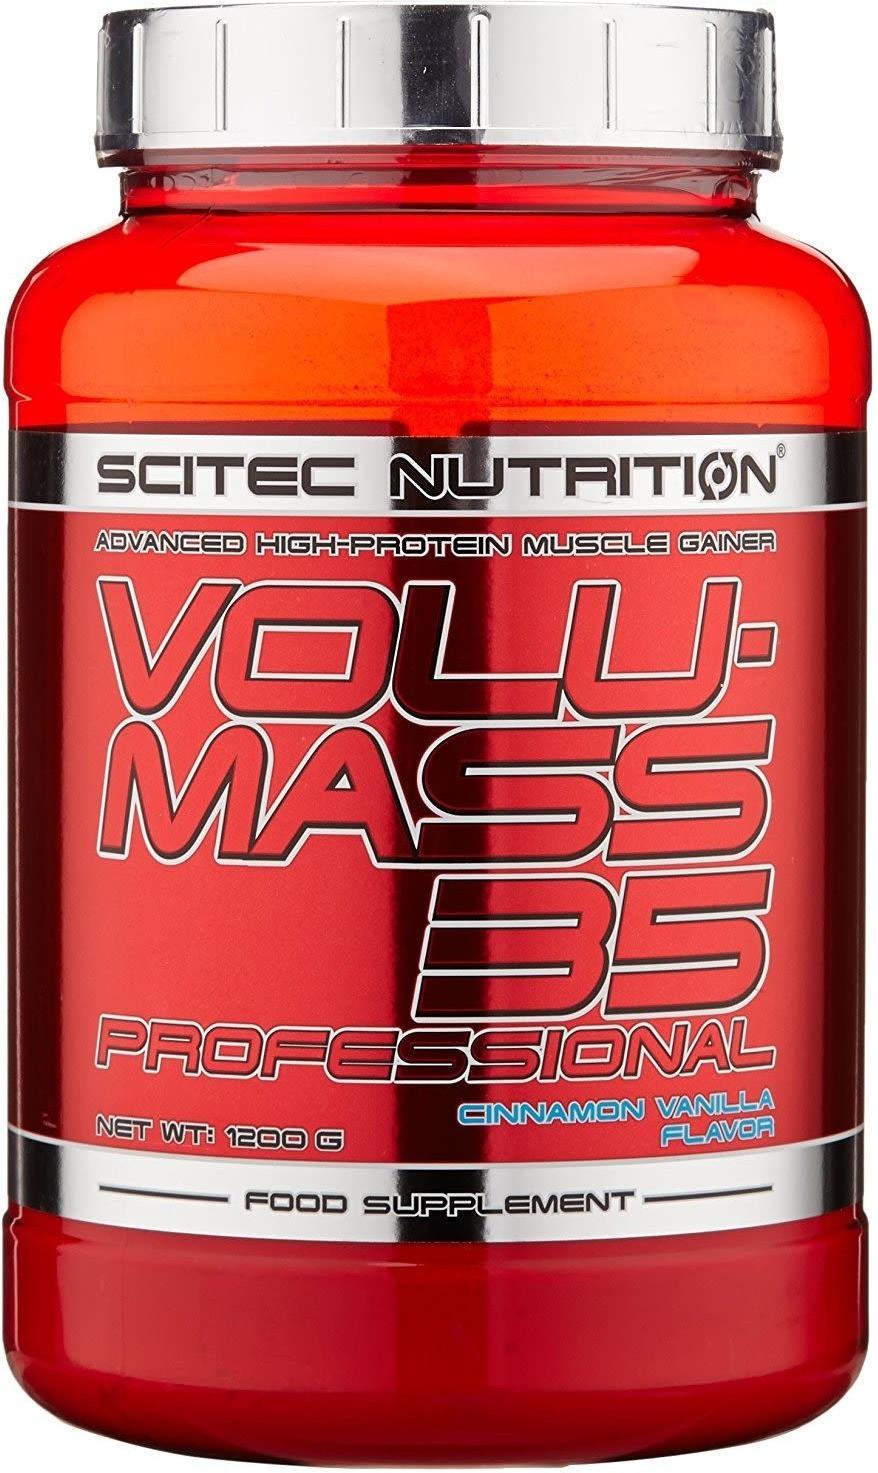 Scitec Nutrition Volumass 35 Professional 1200g